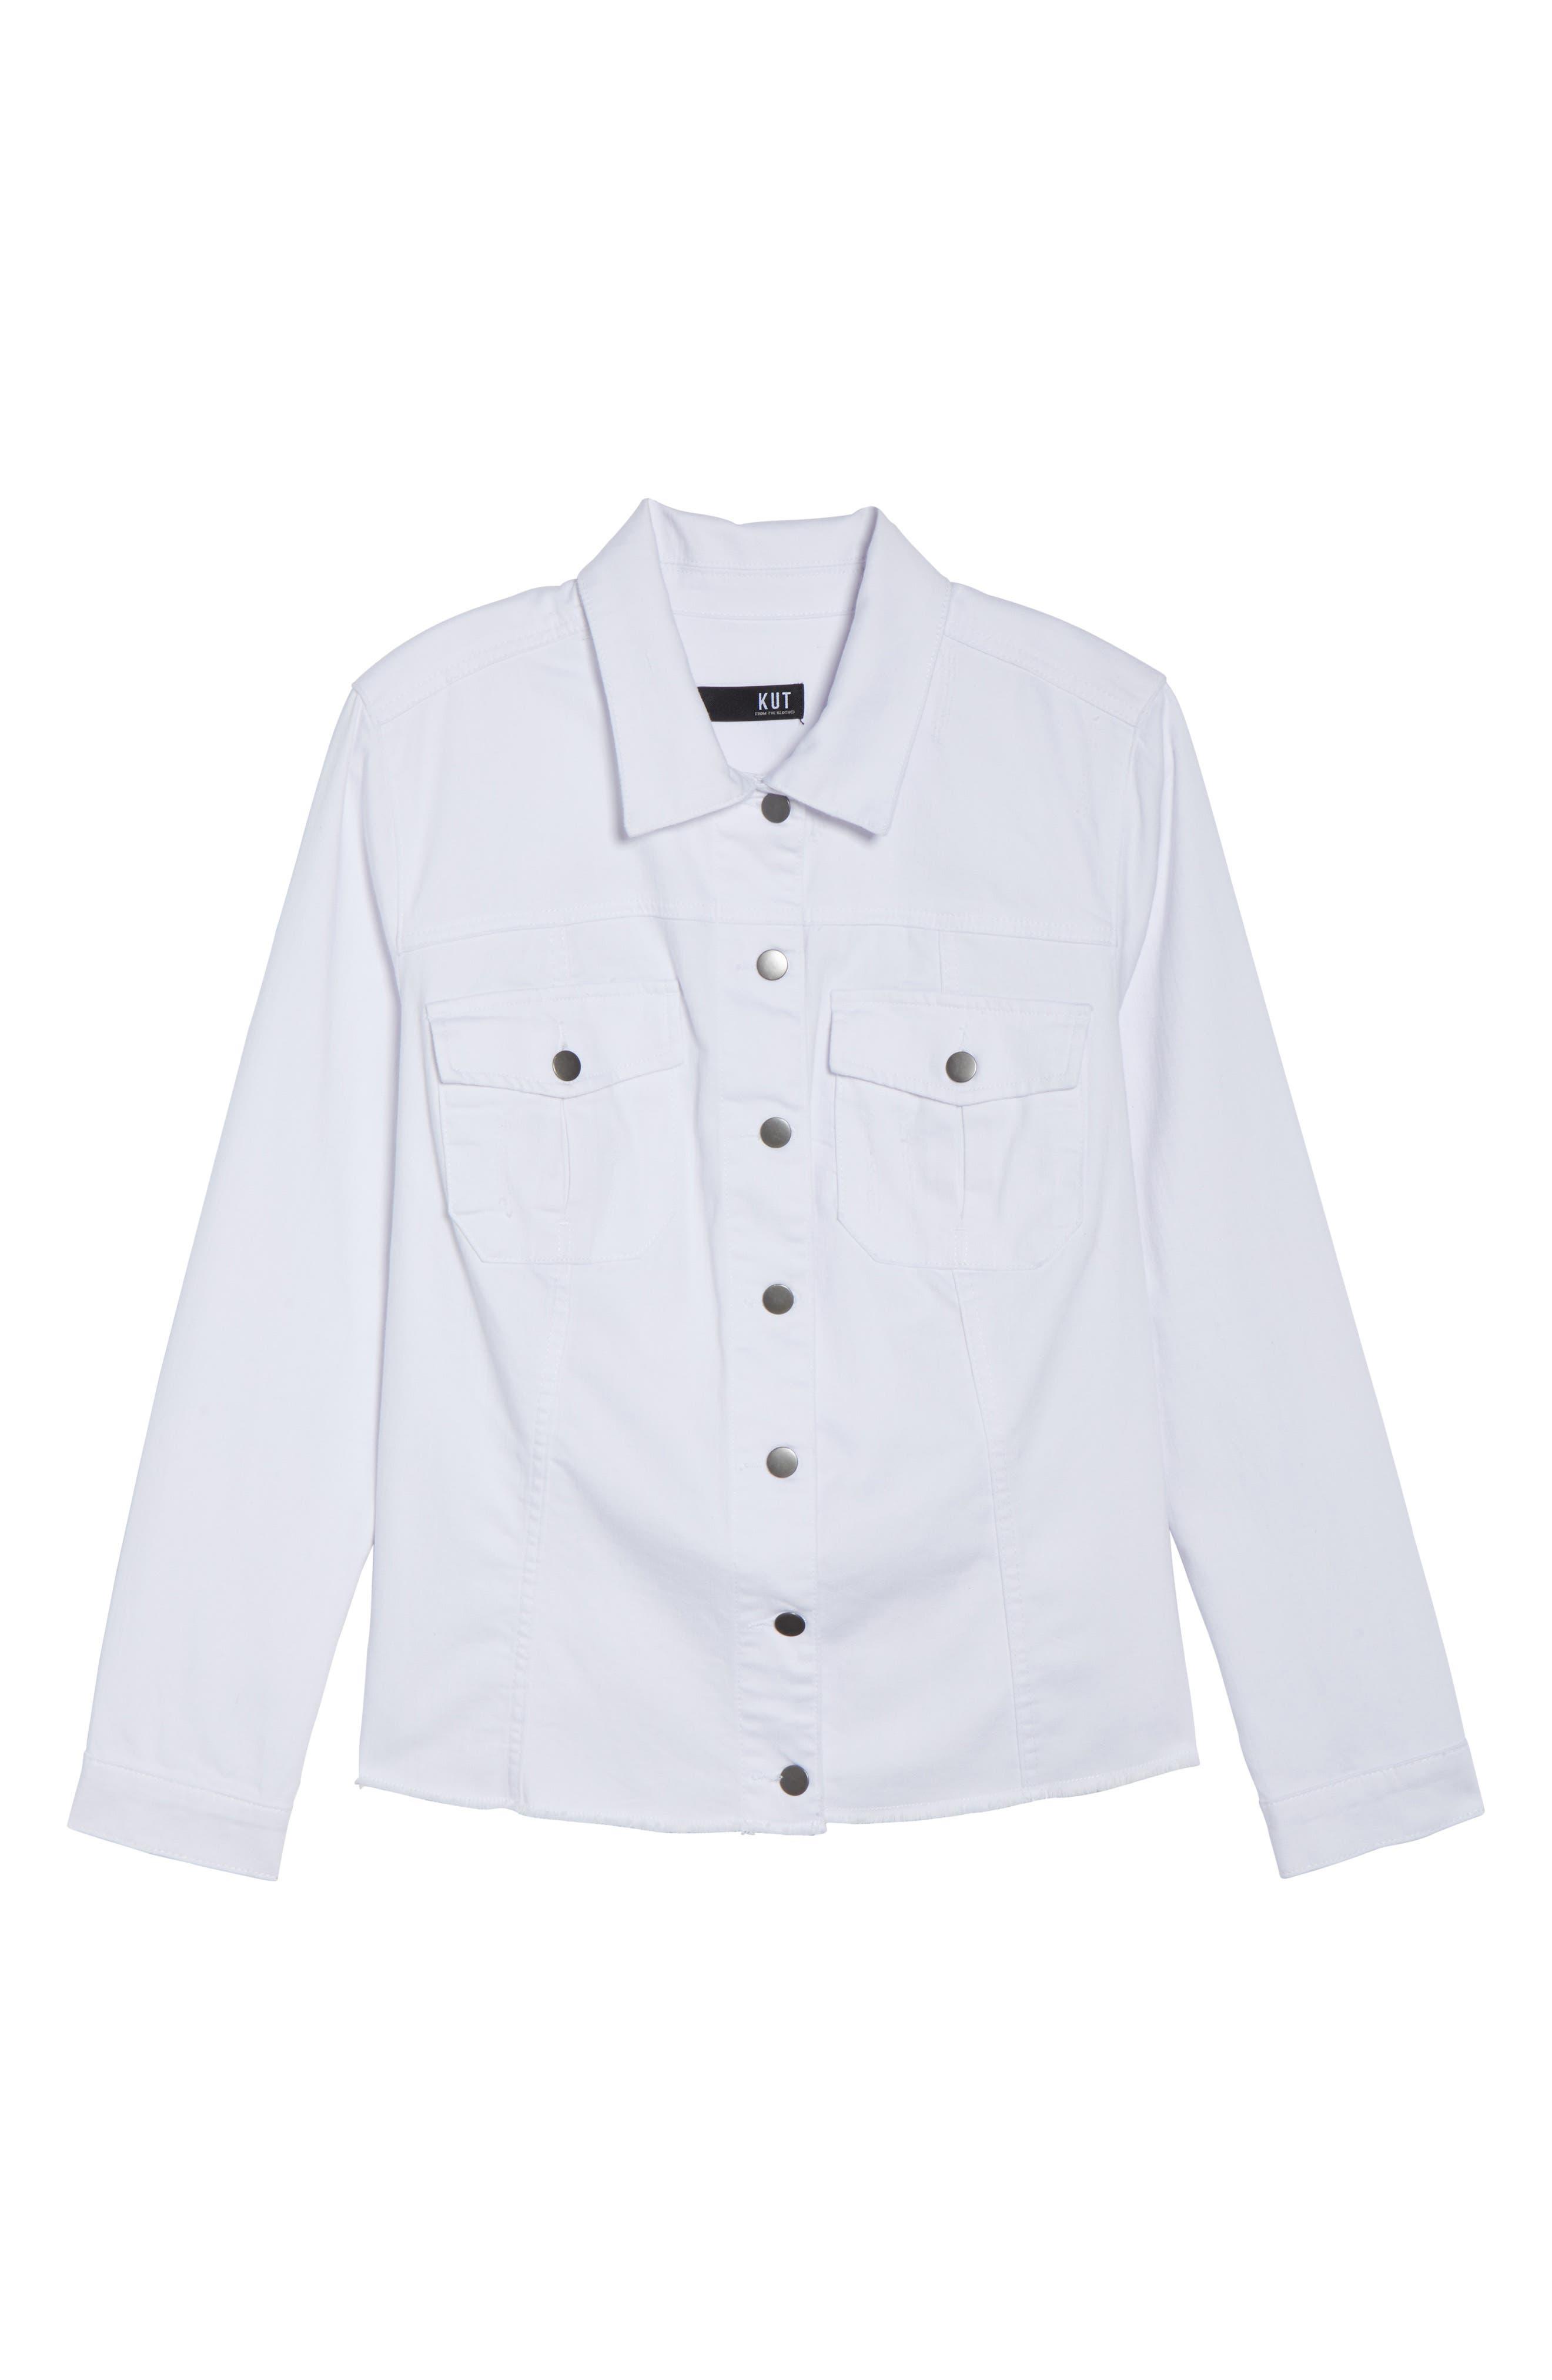 Kara Denim Jacket,                             Alternate thumbnail 7, color,                             Optic White